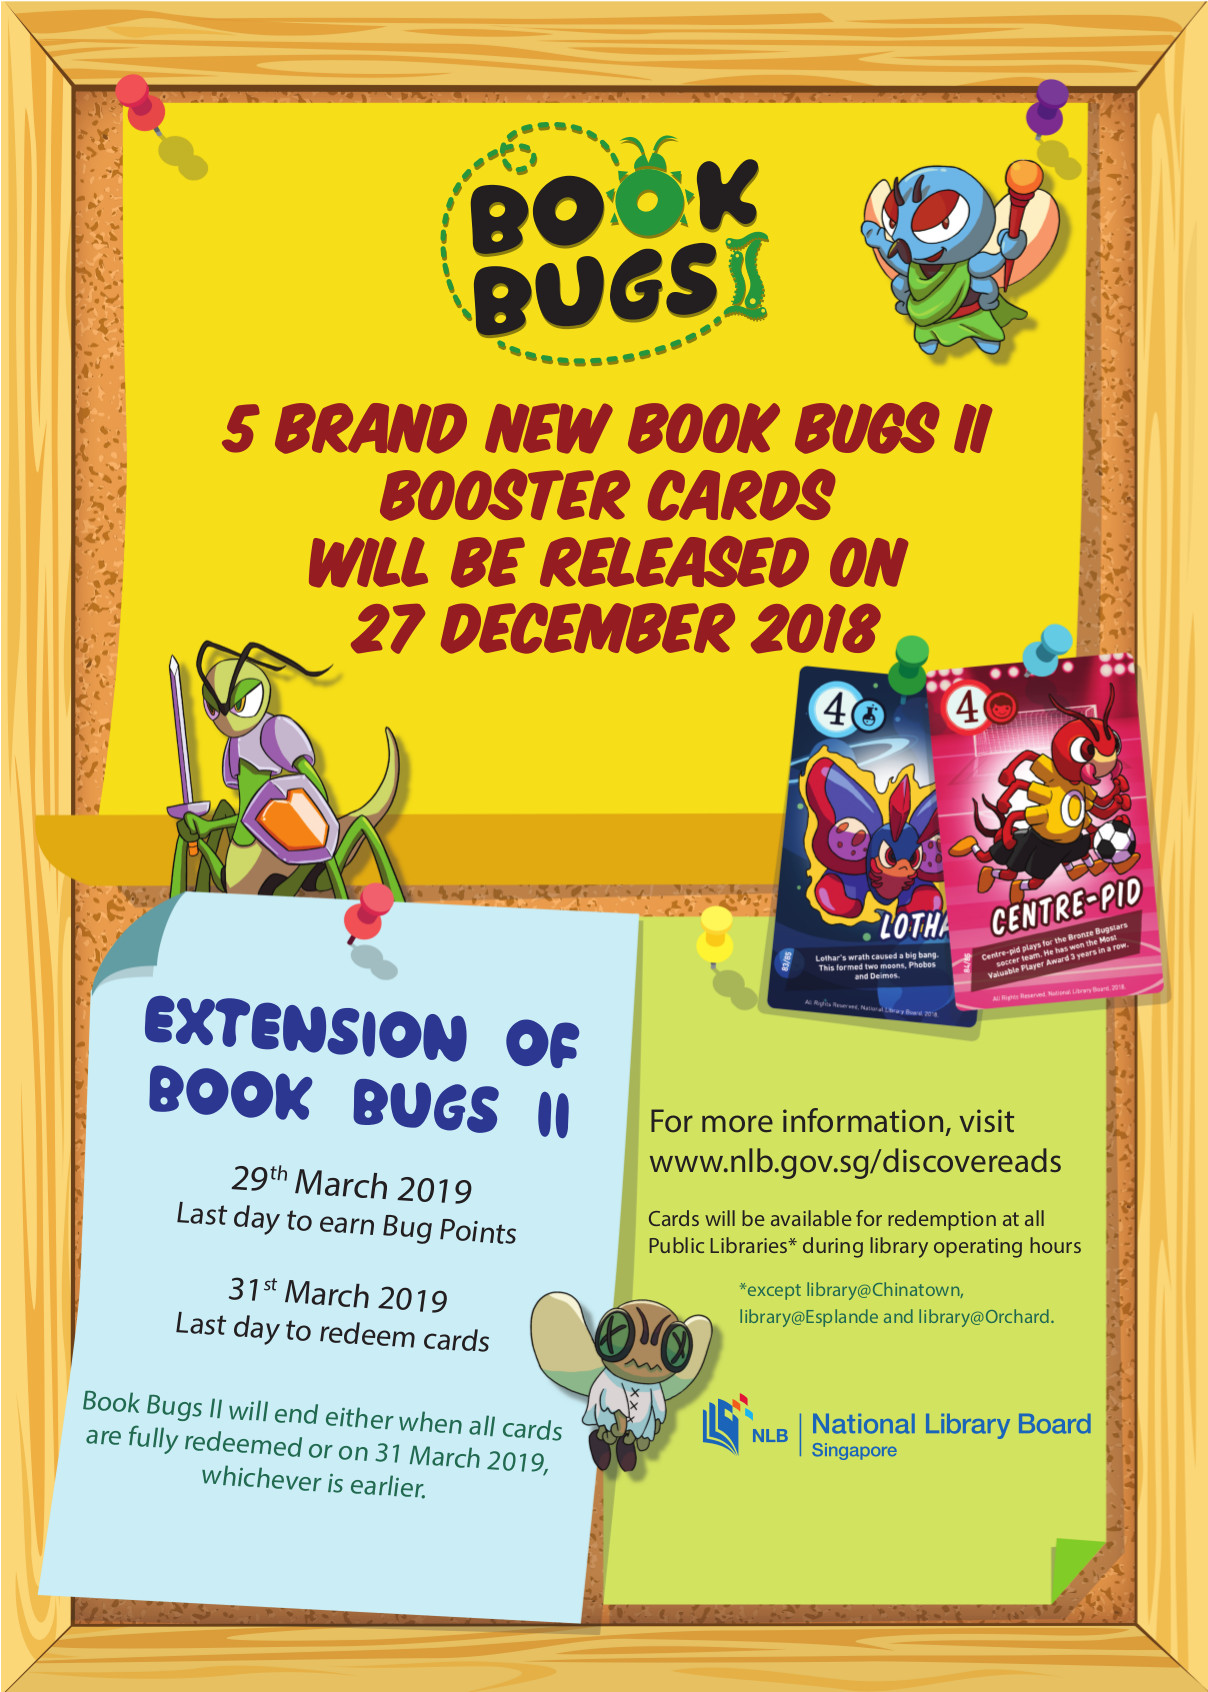 Bookbugs II poster